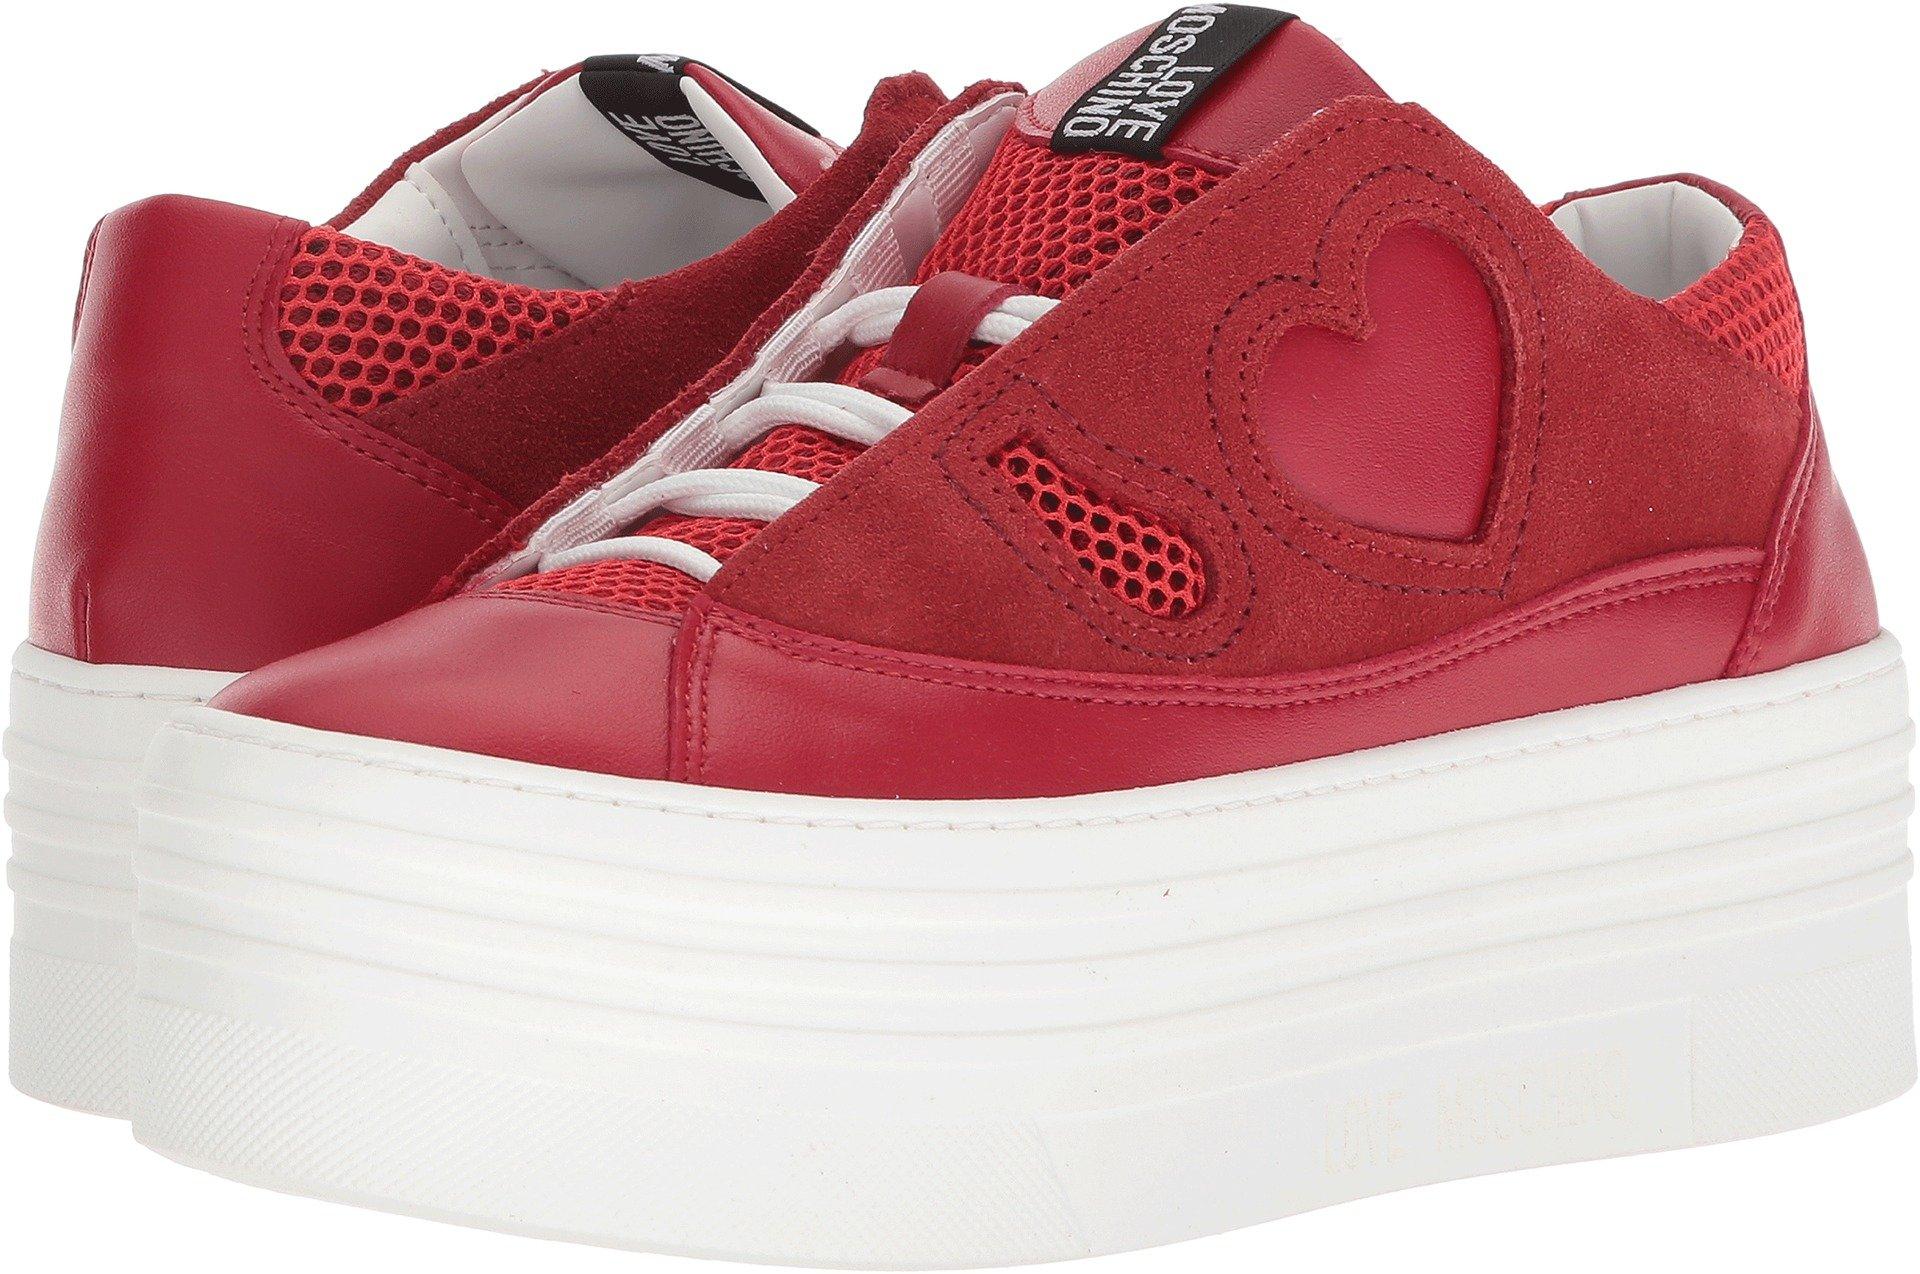 Love Moschino Women's Suede Platform Sneaker Red 35 M EU